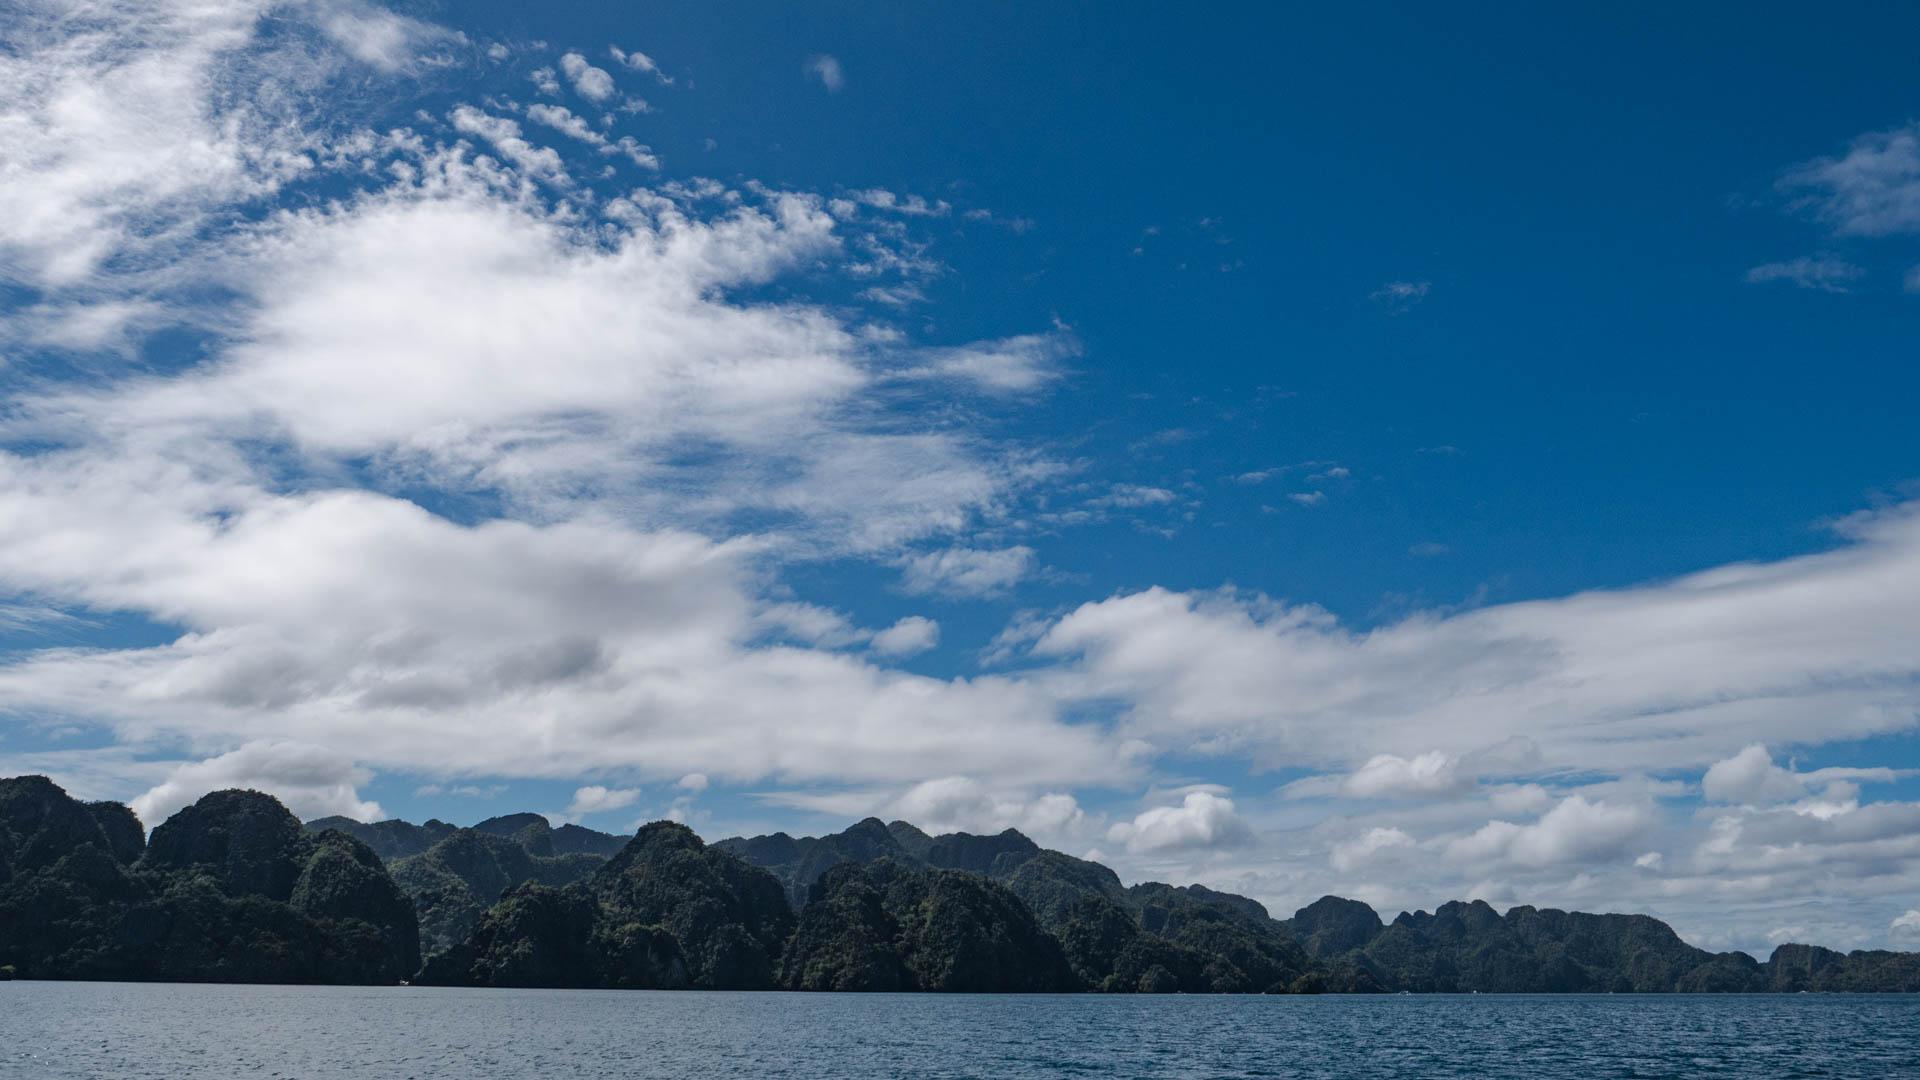 Coron pano - Les globe blogueurs - blog voyage nature